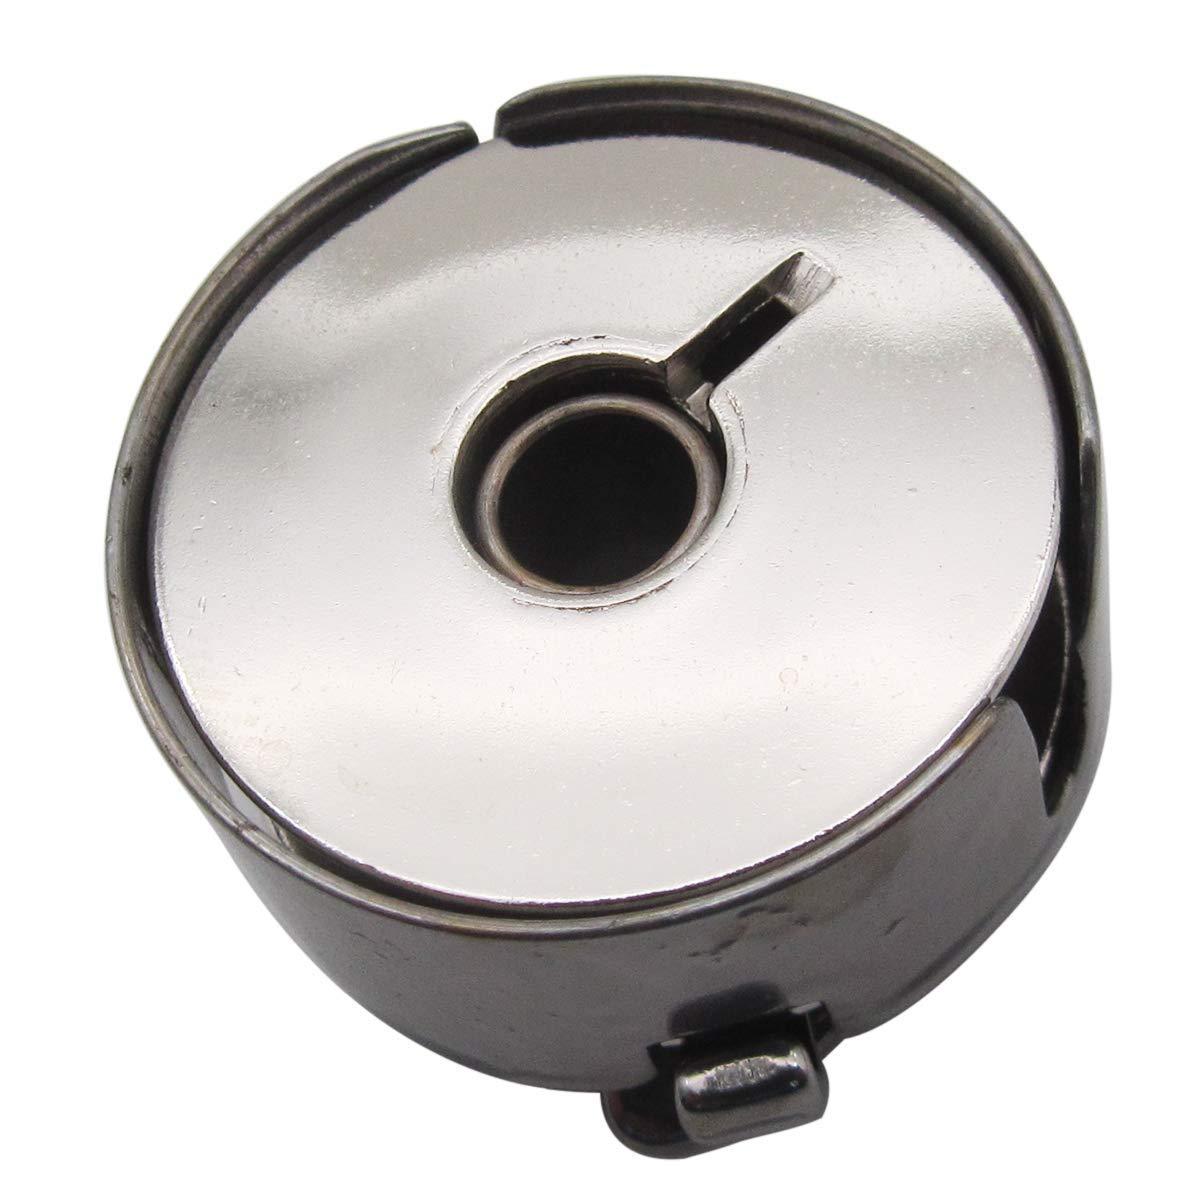 319 206K # 173058 55623S 12 pz bobina custodia e bobine adatto per Singer 206 306W 306K CKPSMS Marca 206W 306